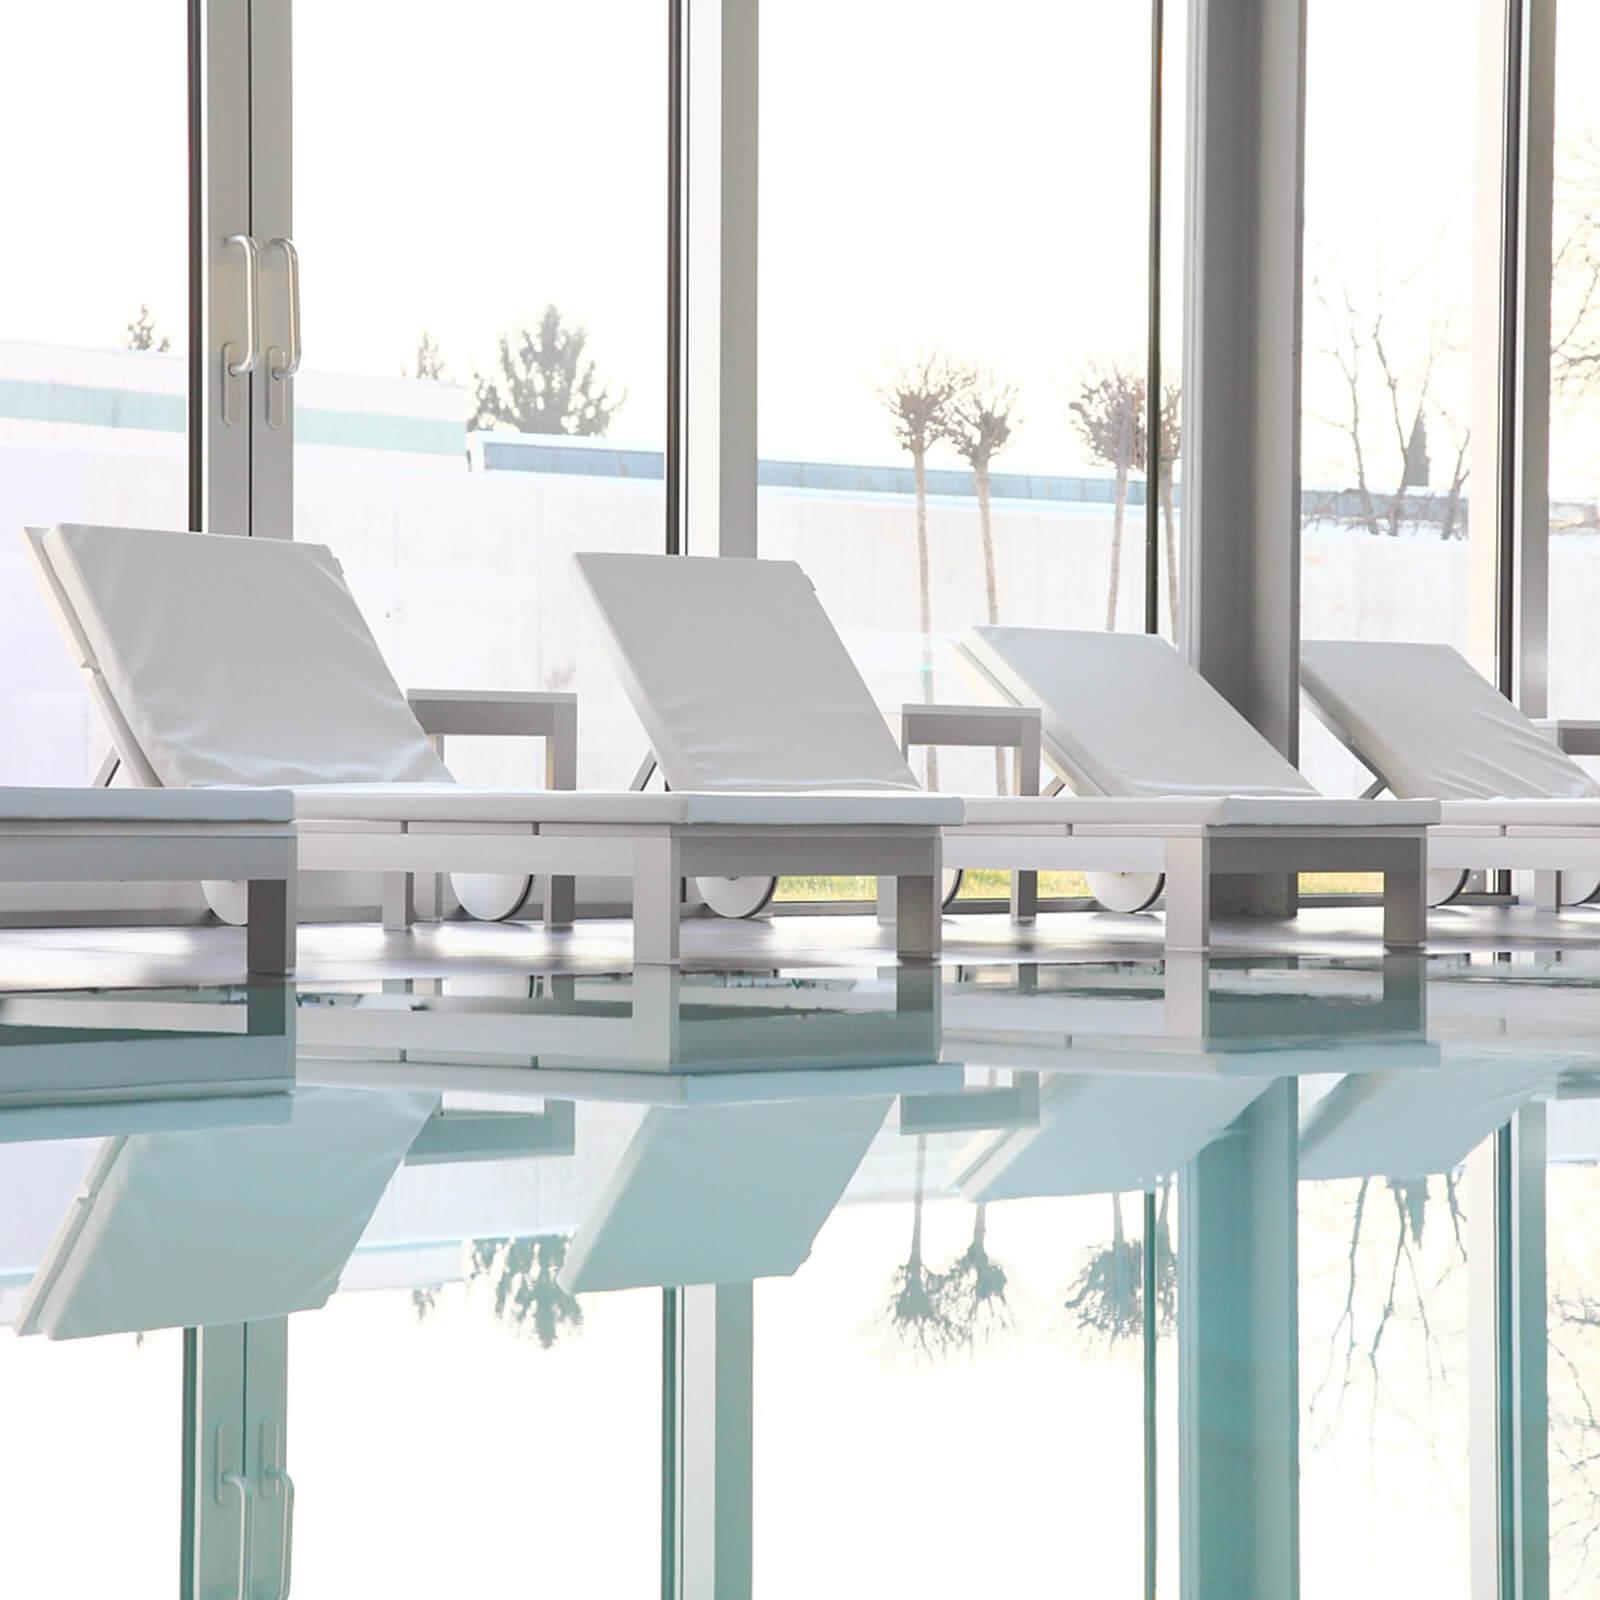 blu-moret-wellness-spa-centro-benessere-udine-piscina-interna